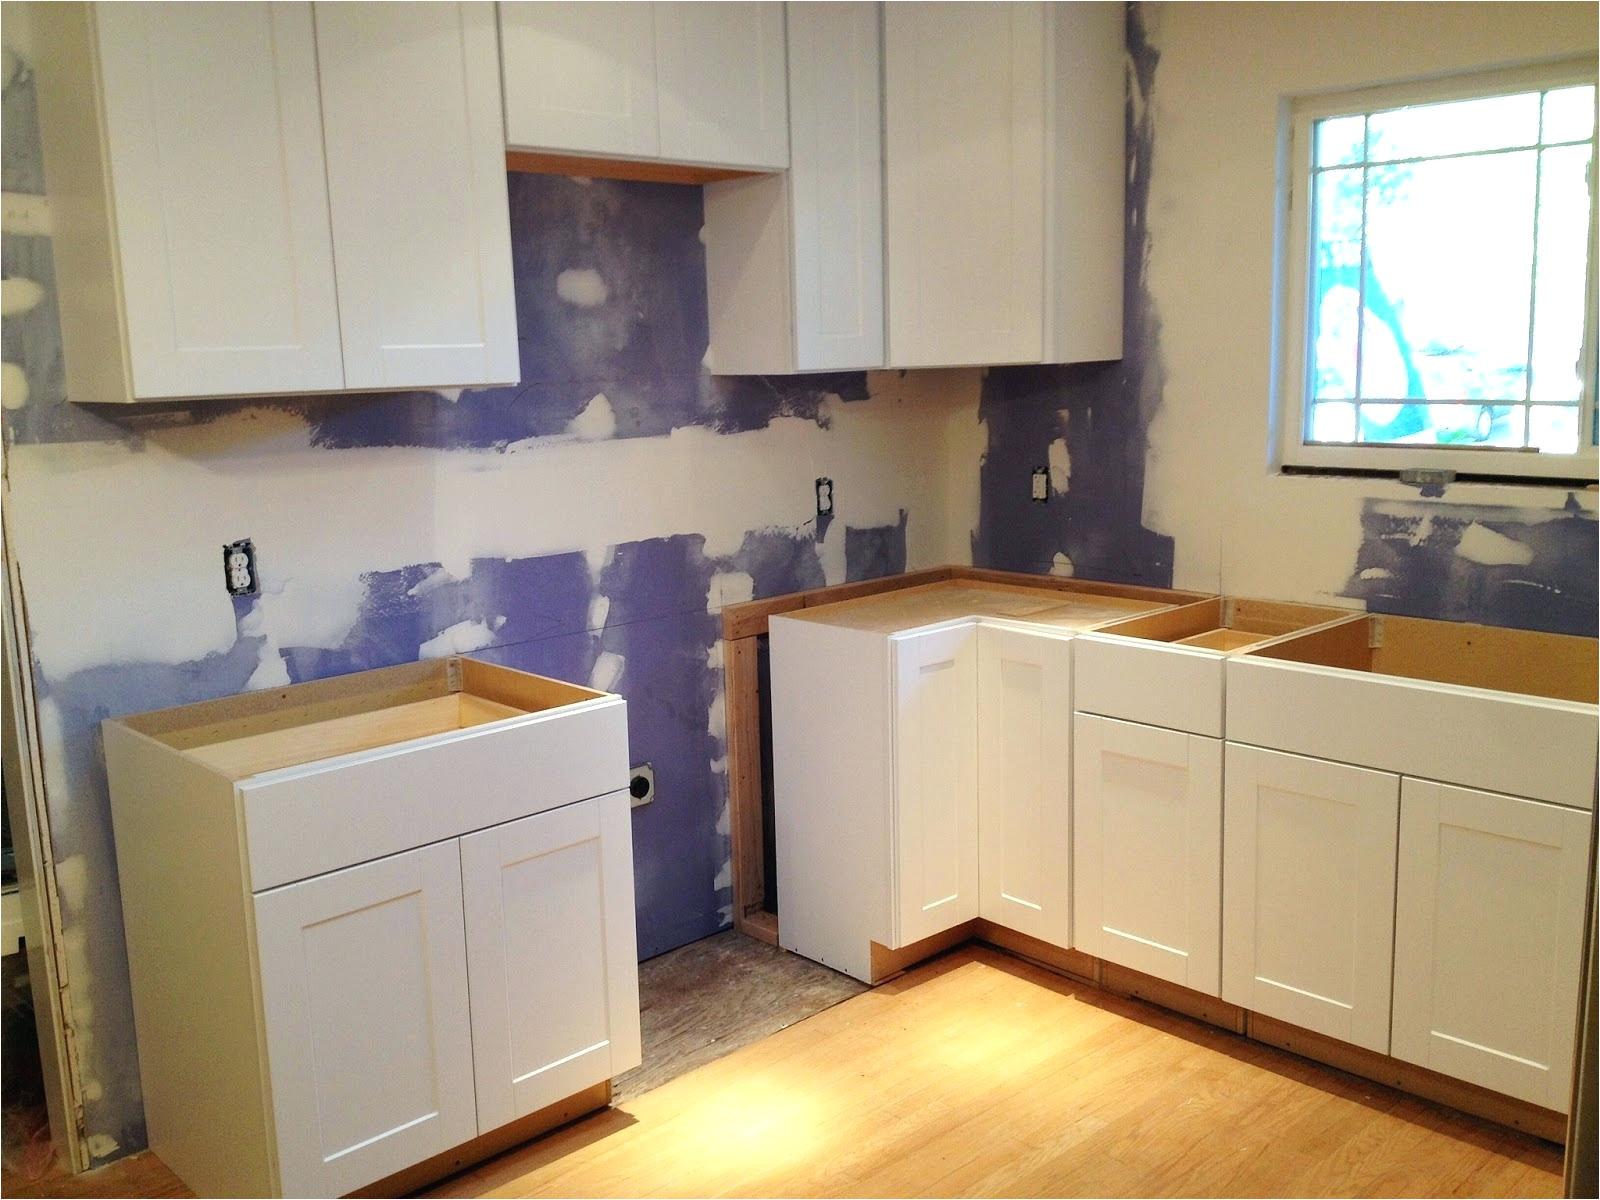 divine hampton bay kitchen cabinets cognac on home depot kitchen cabinets reviews unique hampton bay cabinets